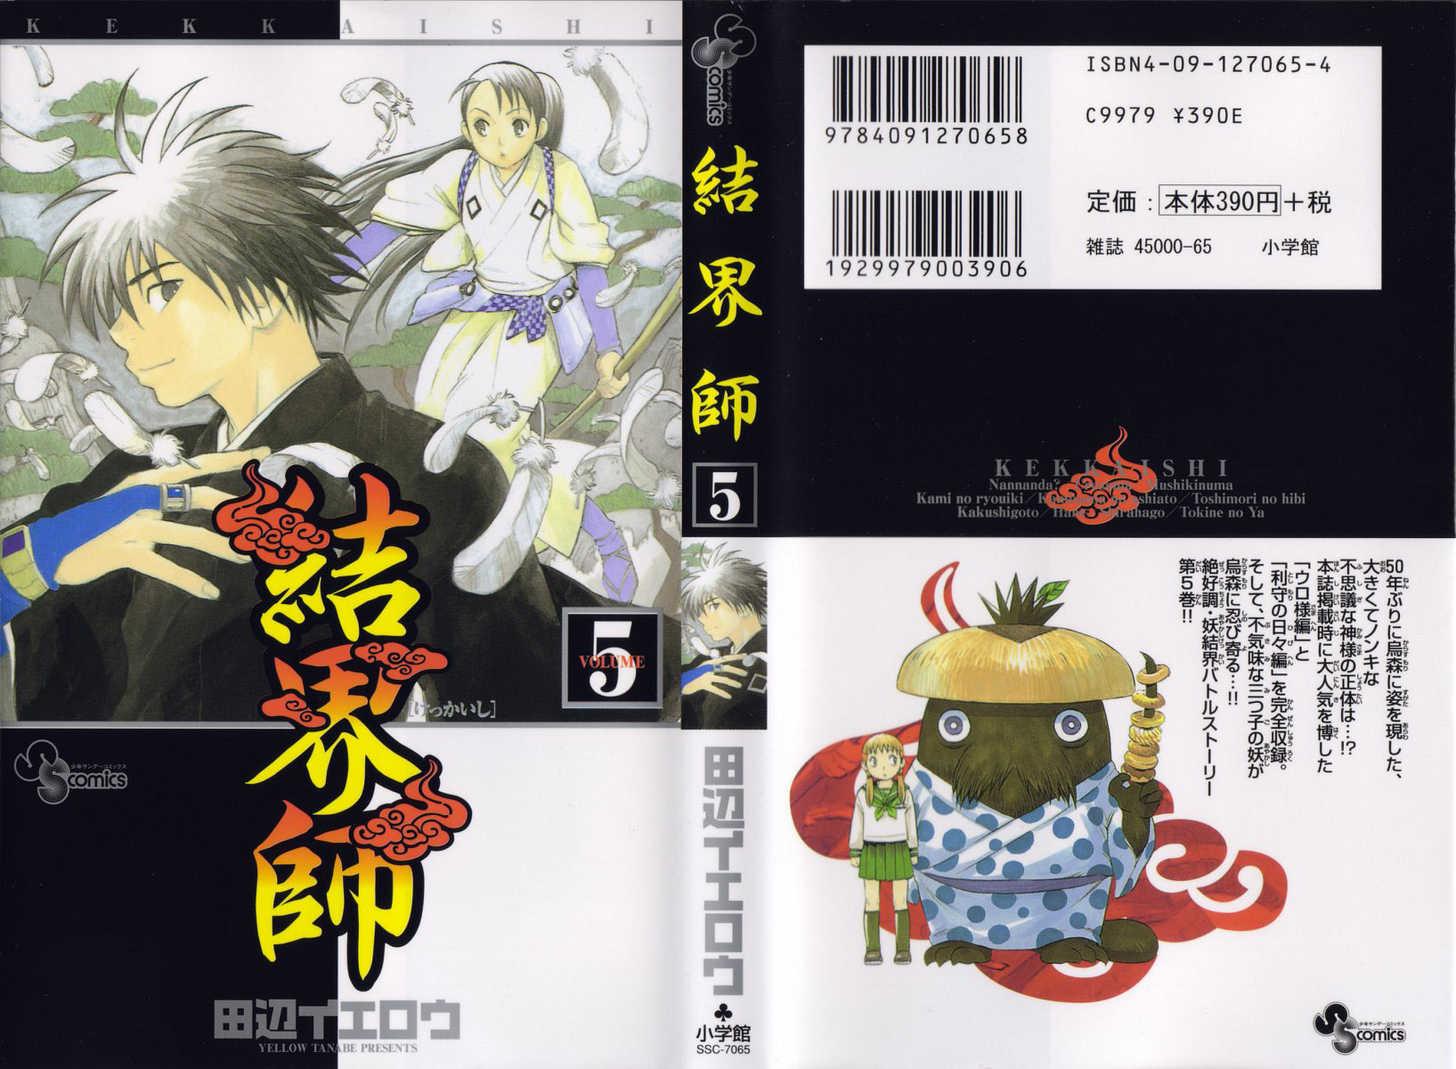 Kekkaishi 36 Page 1